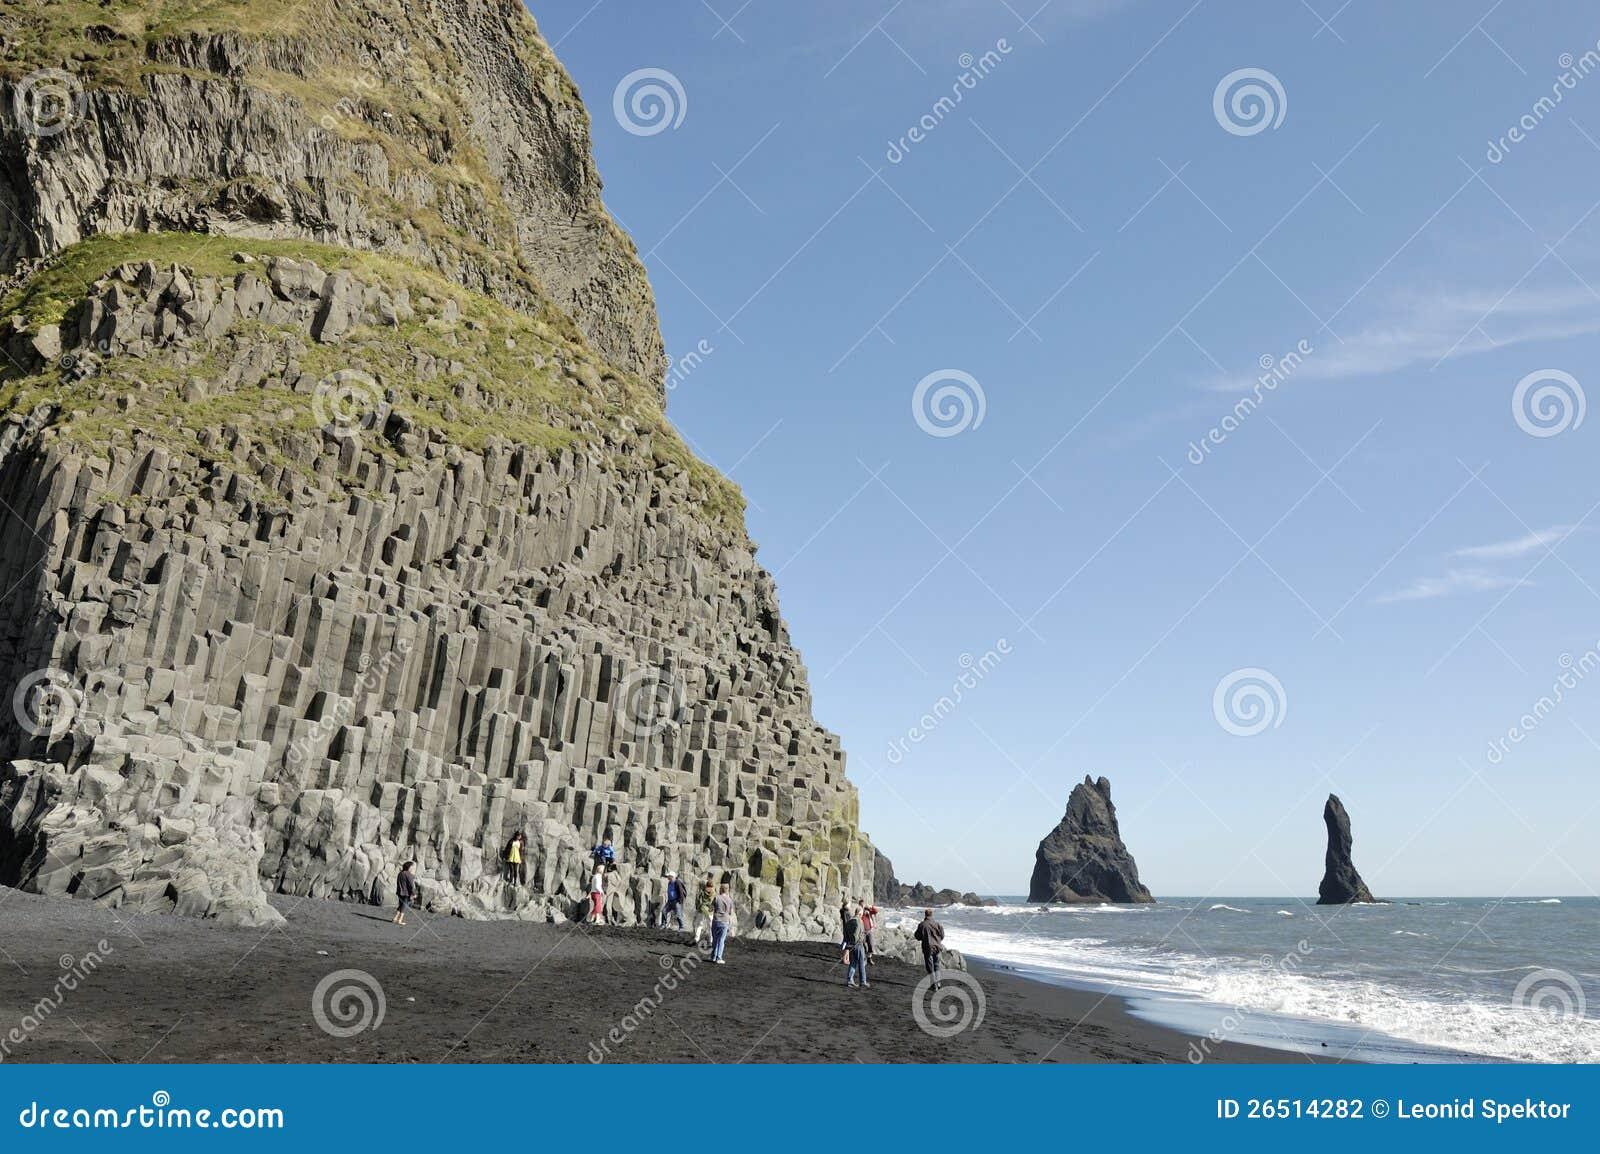 Rocha do basalto na praia vulcânica em Islândia.